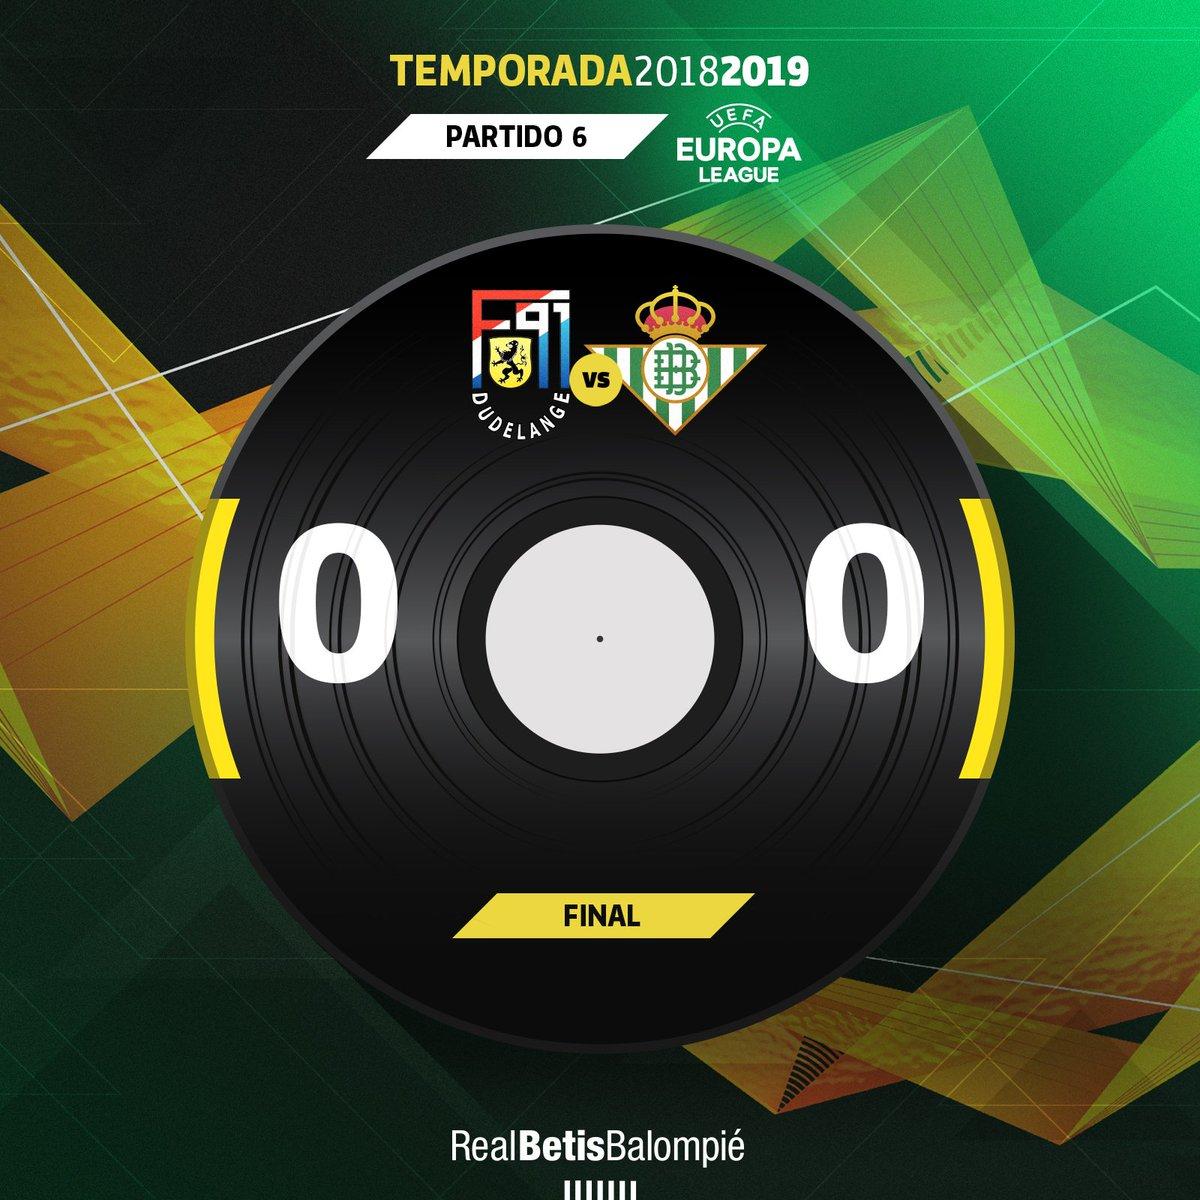 94 ⏱⚽️ Final del partido con empate verdiblanco ⚖ ¡Somos primeros de grupo! ⚪⚫ #DudelangeRealBetis 0-0 💚⚪️ #DíaDeBetis #EuroBetis